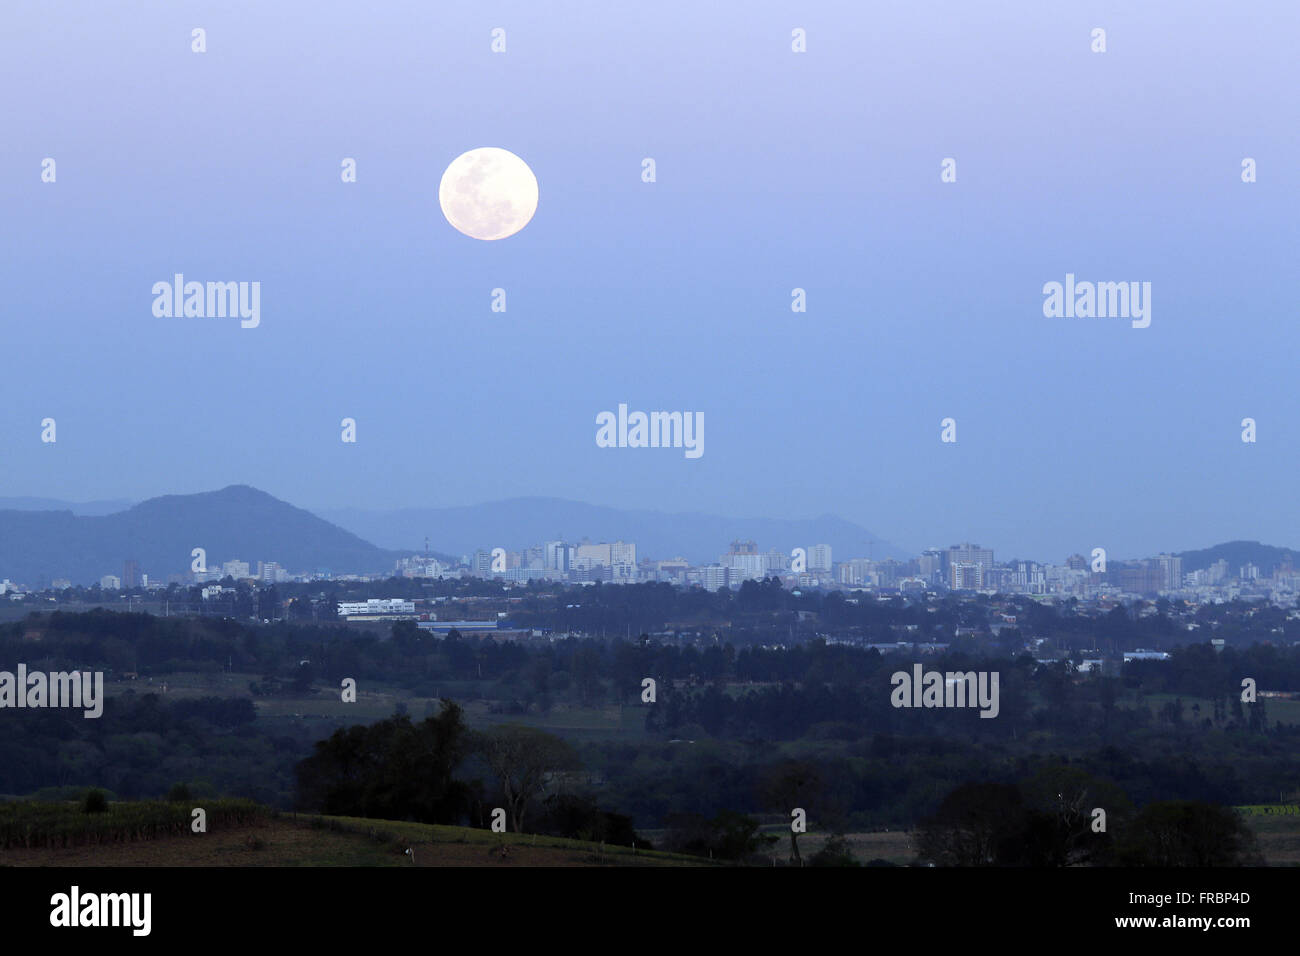 Phenomenon of Superlua during the full moon - Stock Image